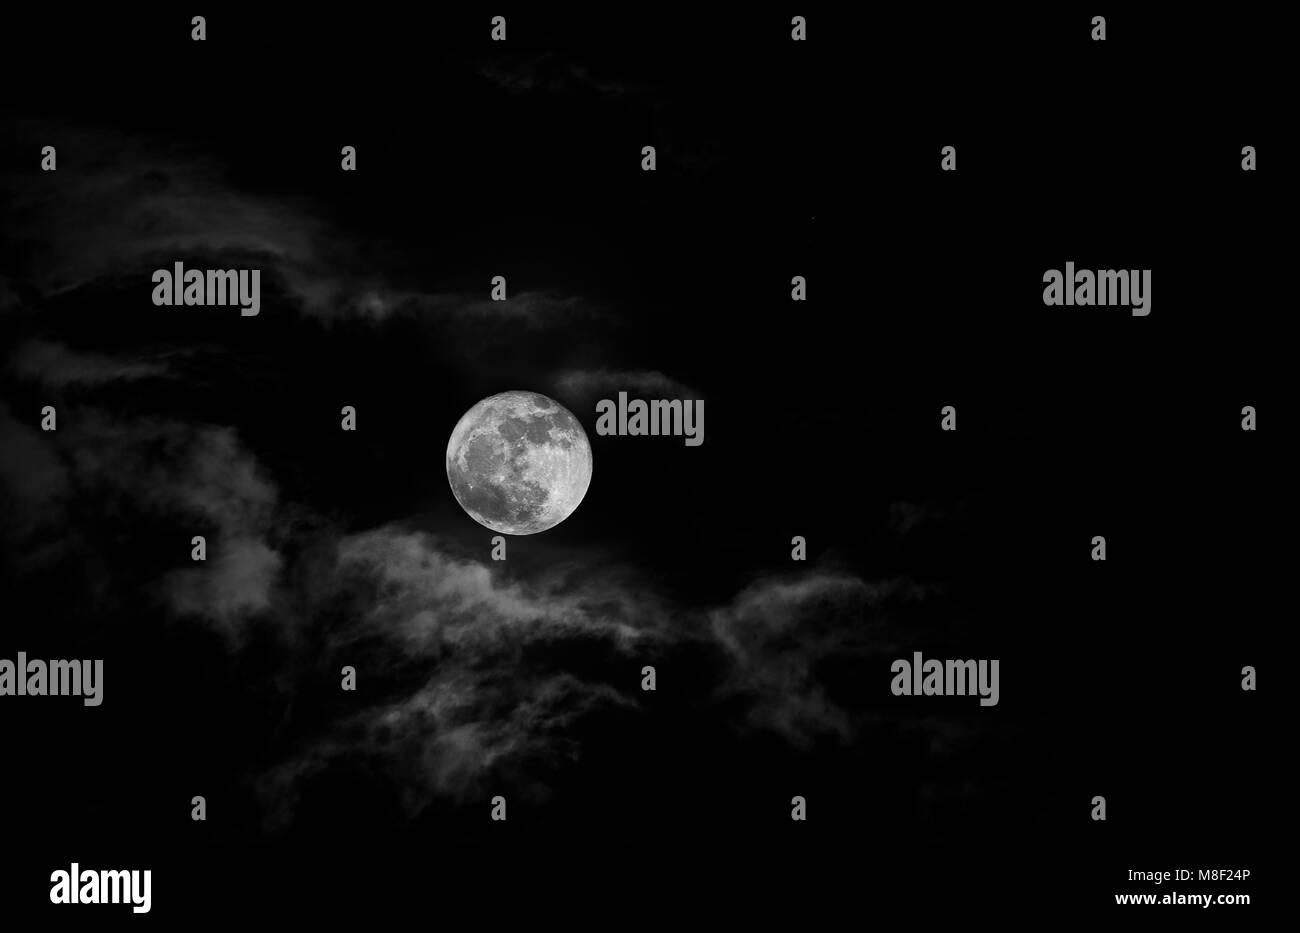 Full moon in night sky - Stock Image